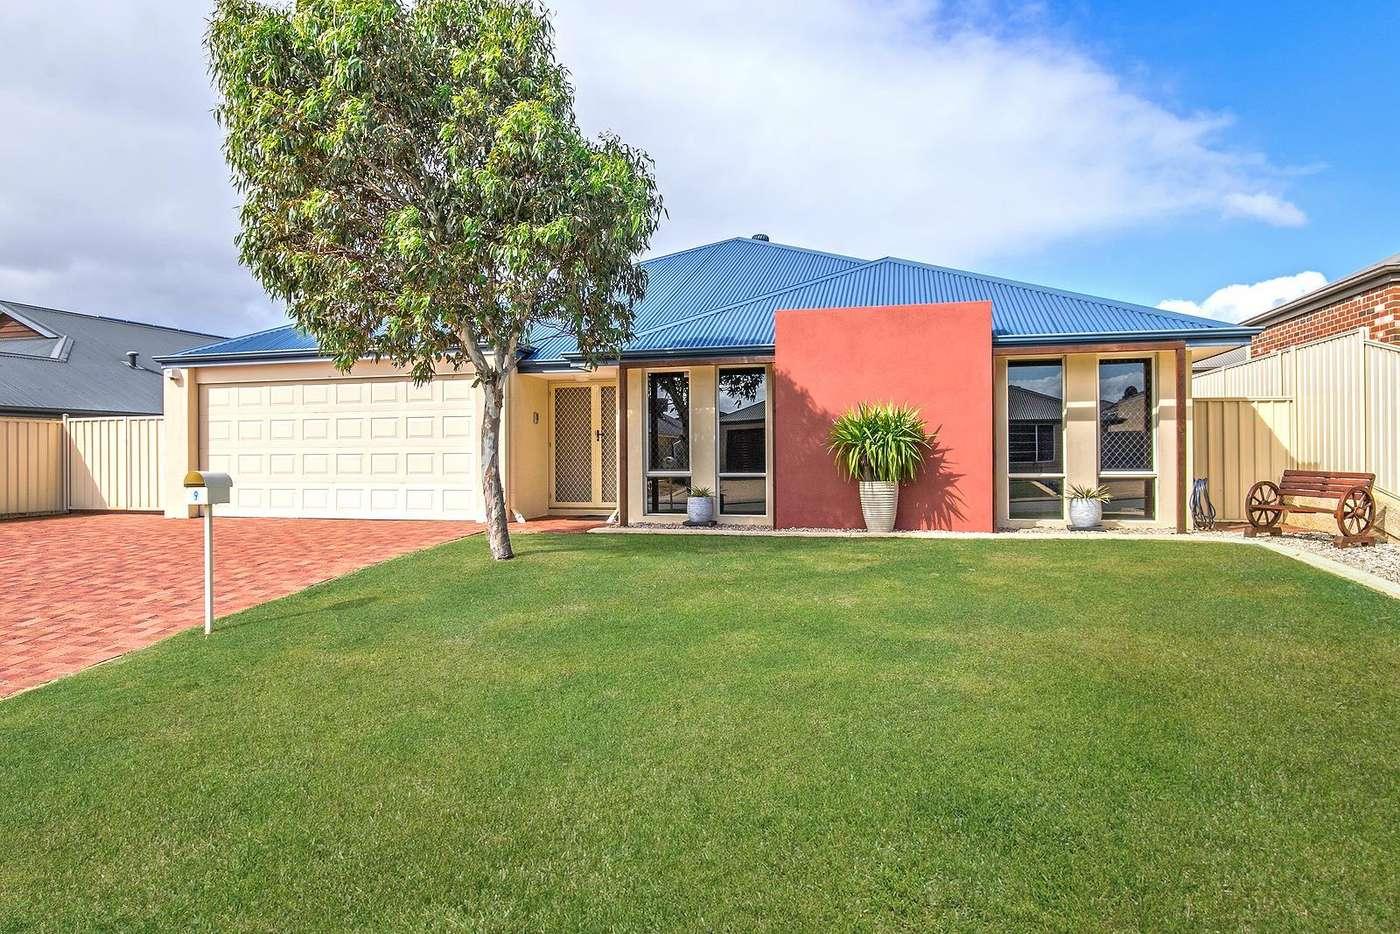 Main view of Homely house listing, 9 Rathbun Street, Secret Harbour WA 6173